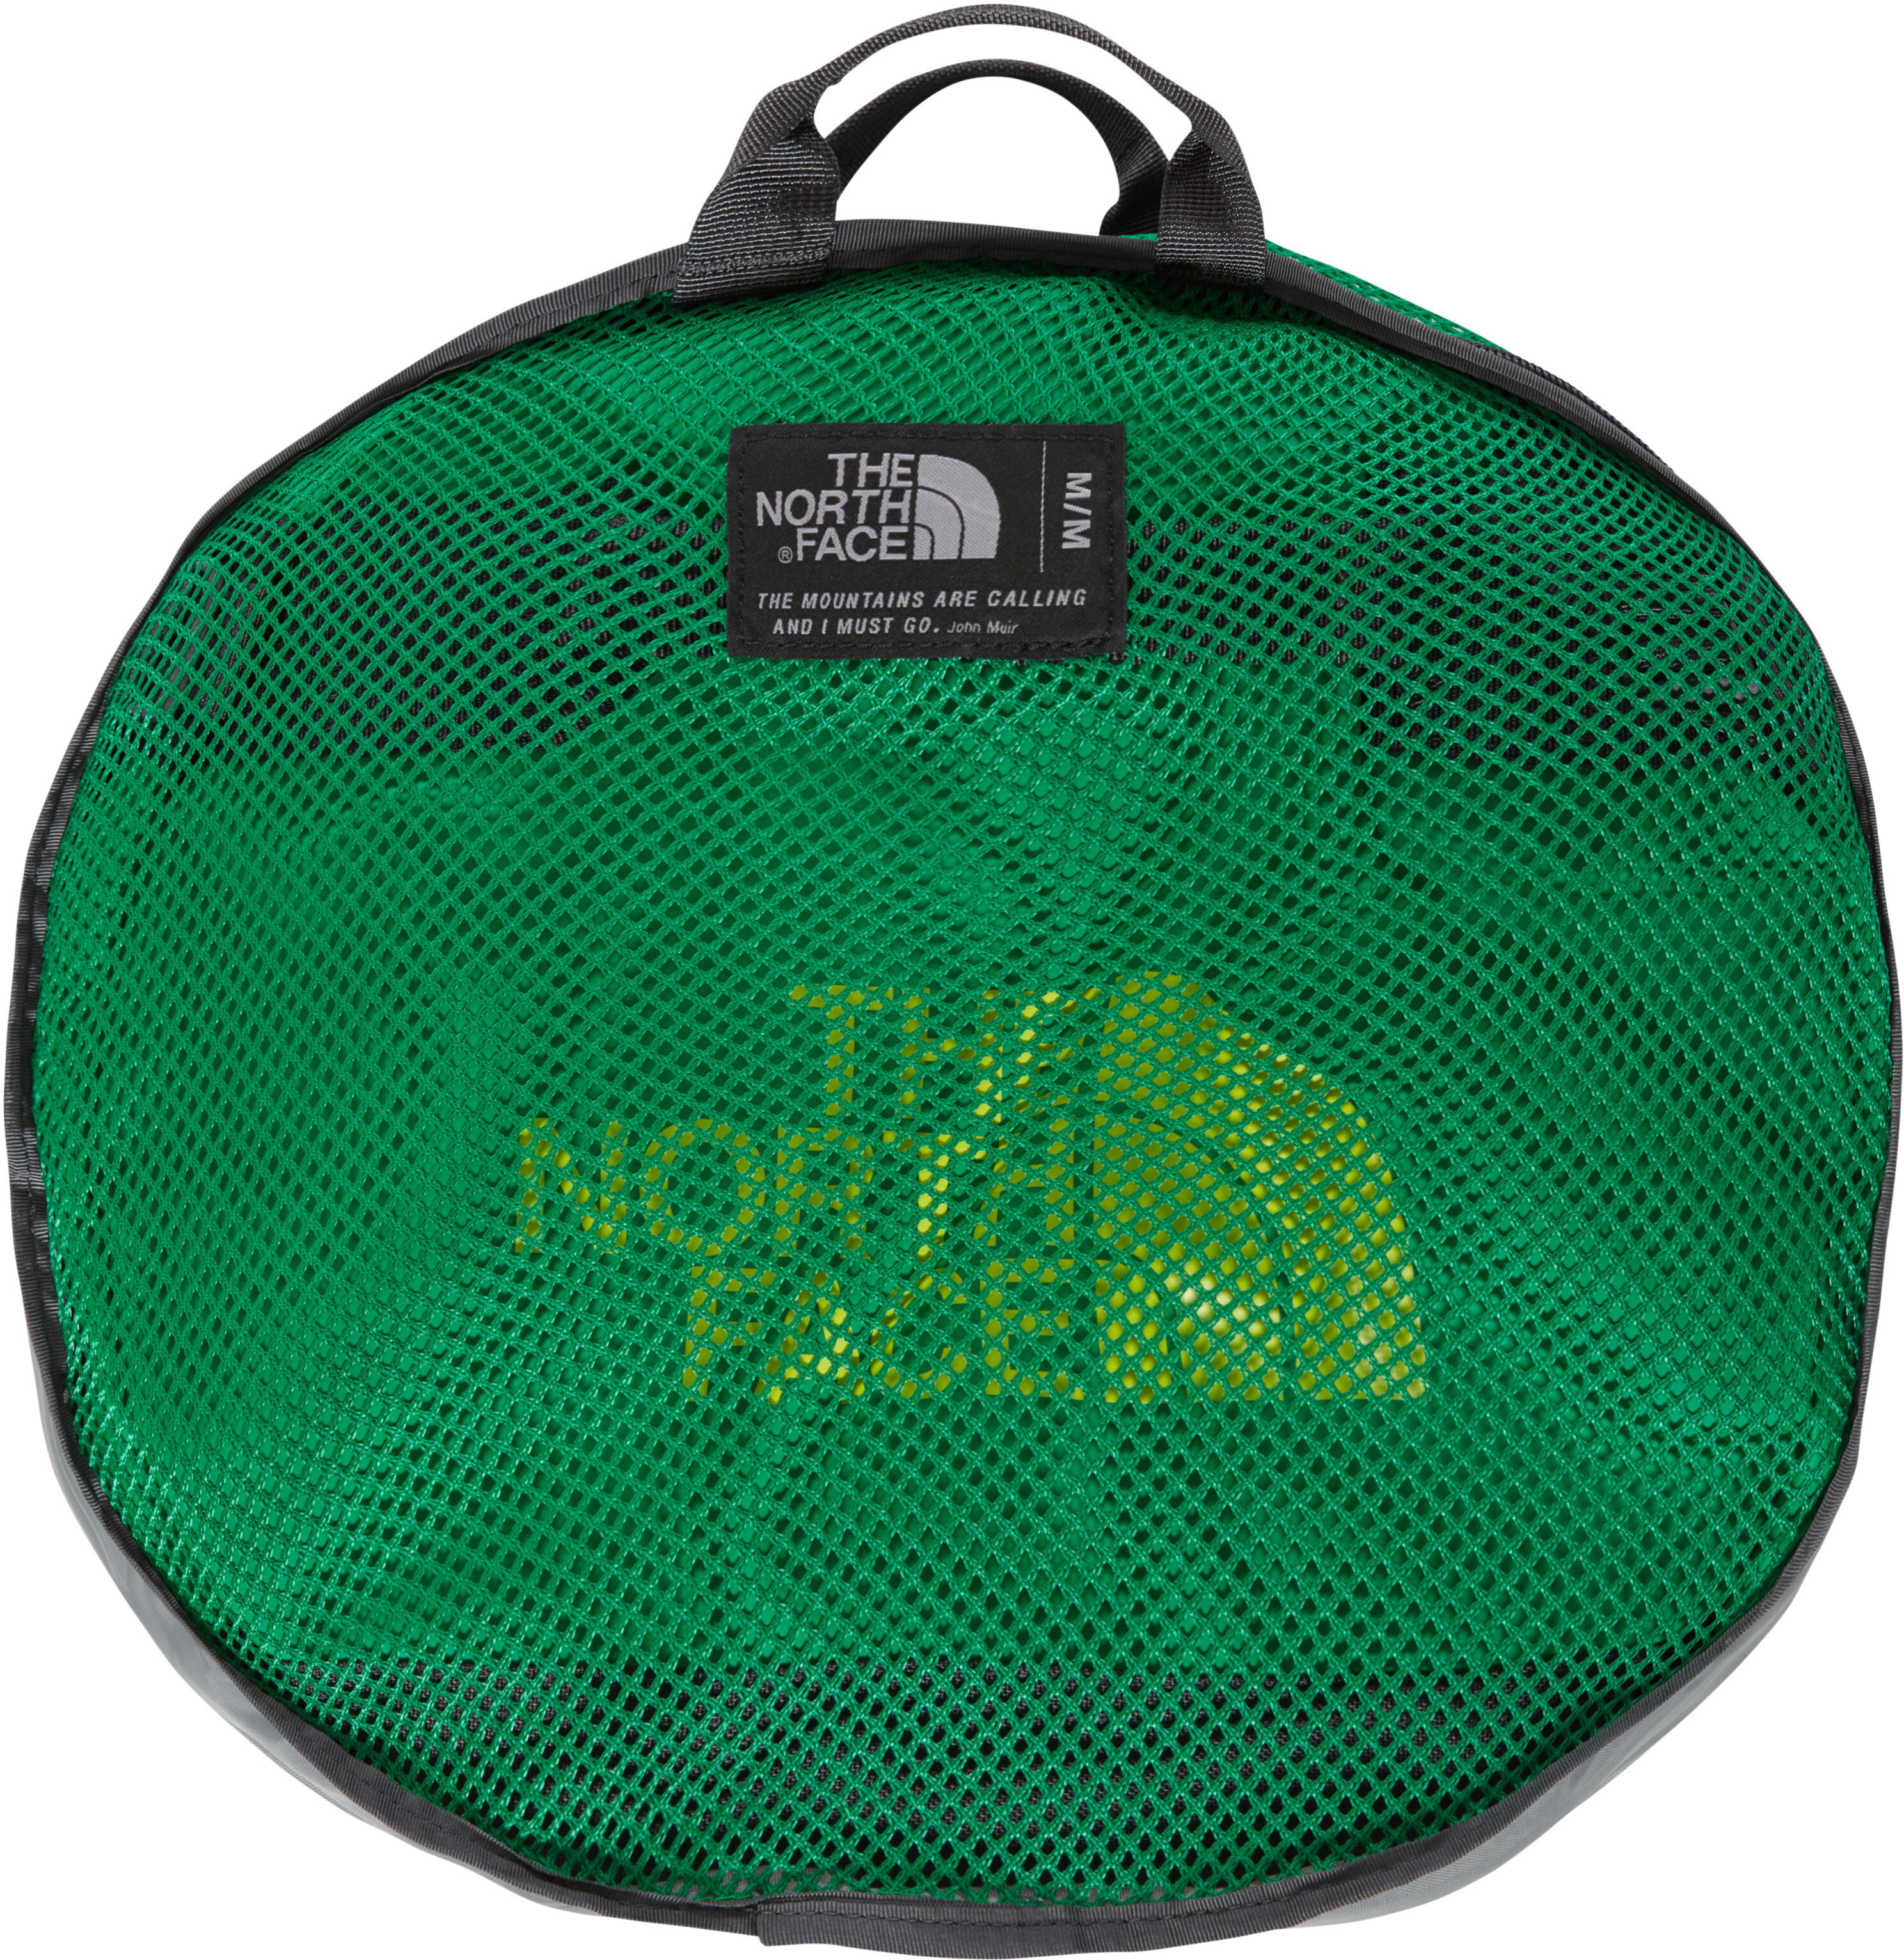 The North Face Base Camp Valigie M verde nero su Addnature 2b4cd0f43870